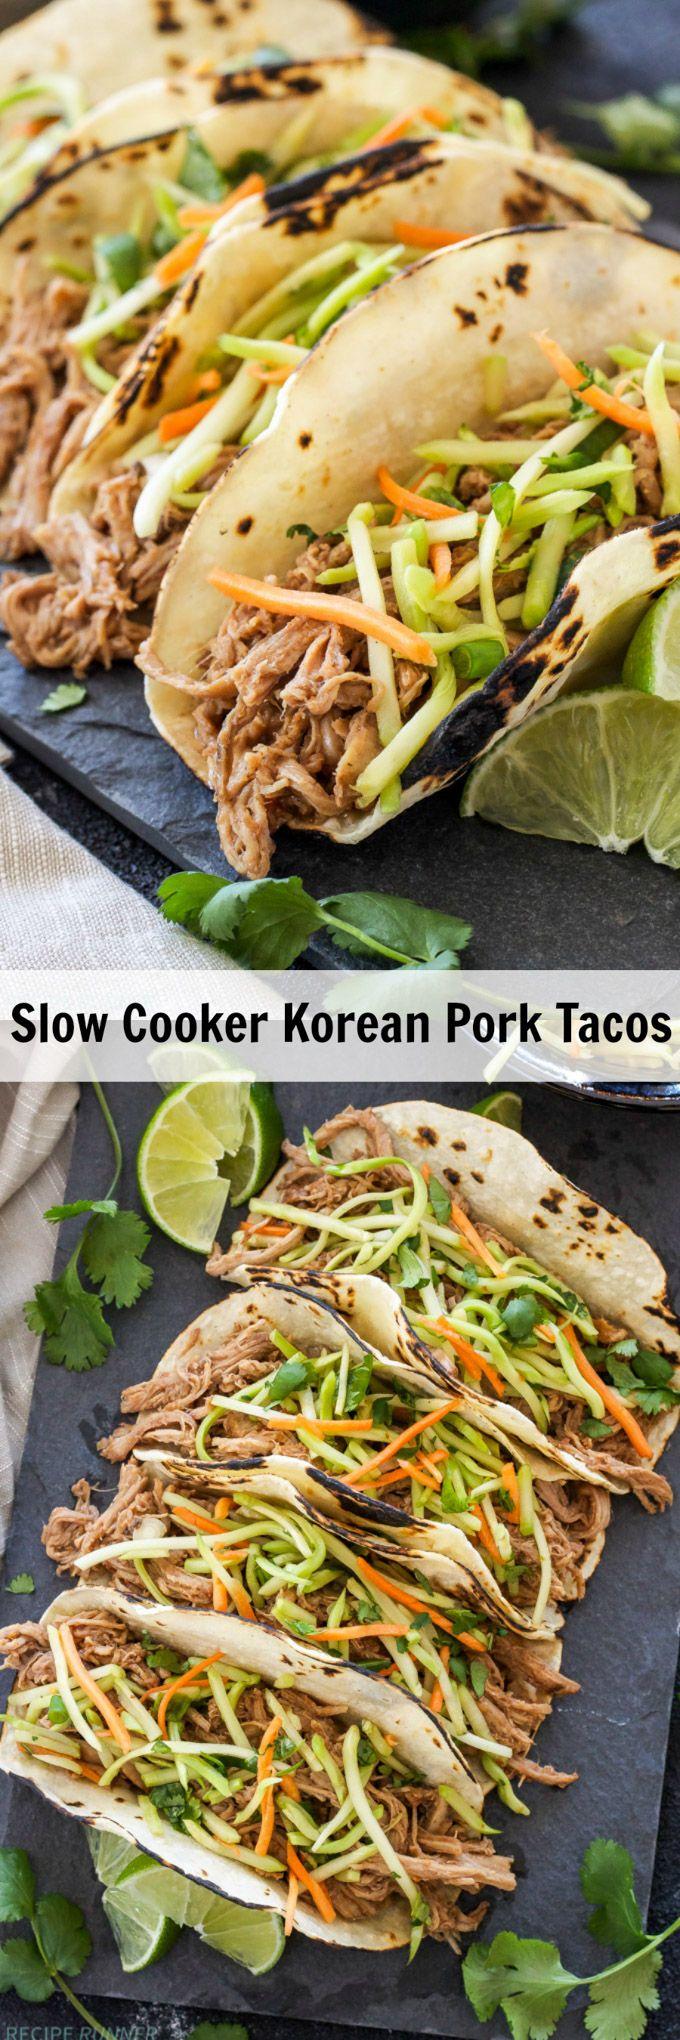 Slow Cooker Korean Pork Tacos | Pork tenderloin slow cooked in bold Korean BBQ spices makes a delicious, moist, shredded filling for tacos!